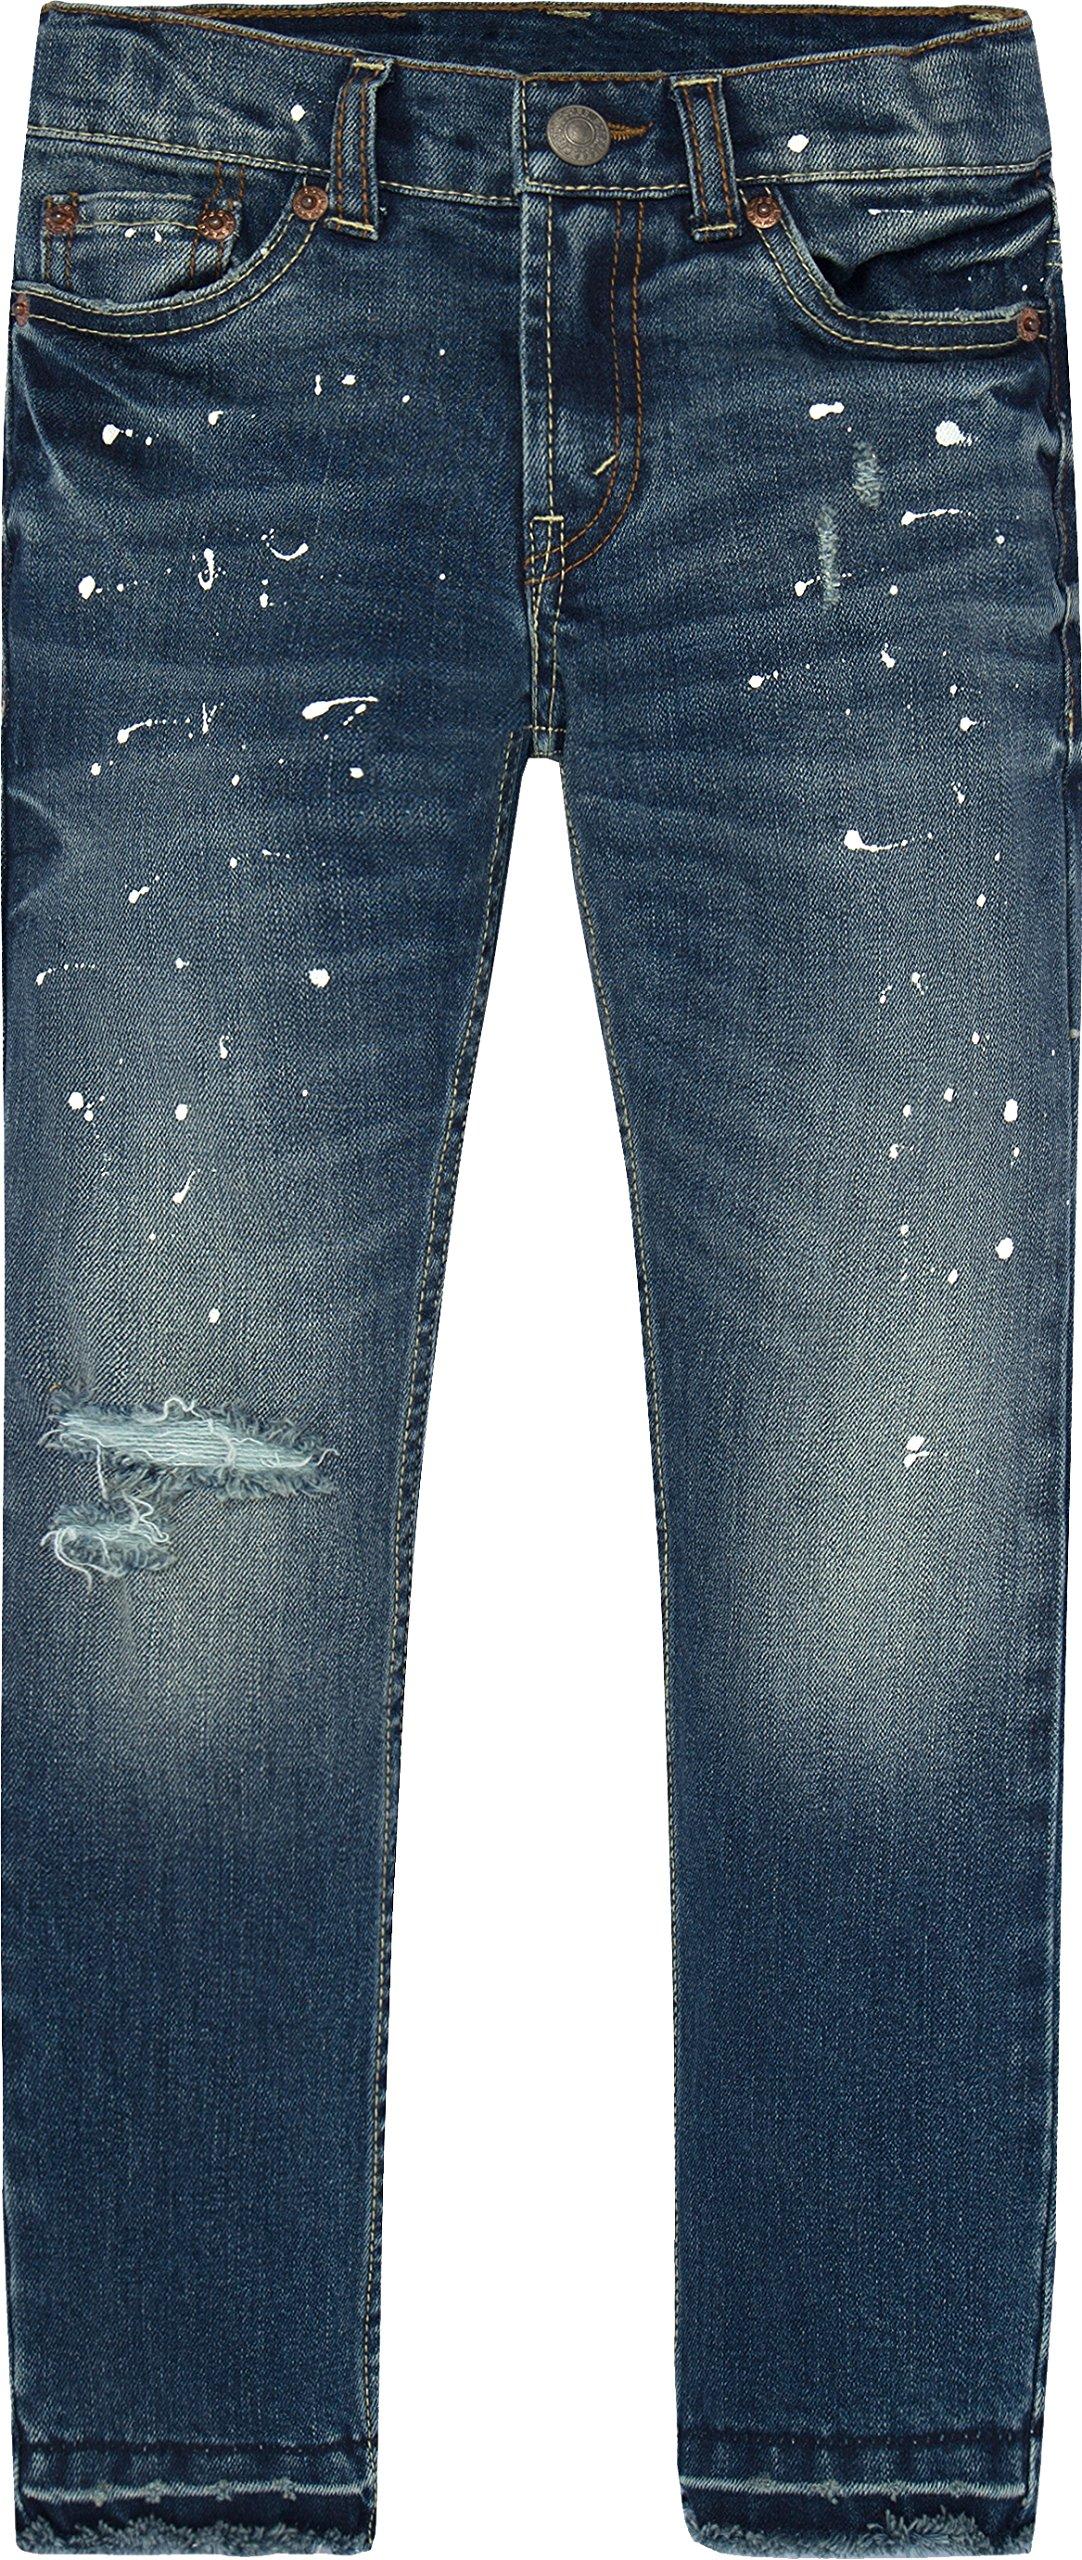 c071a9da Galleon - Levi's Boys' Big 511 Slim Fit Distressed Jeans, Catalina Island,  12